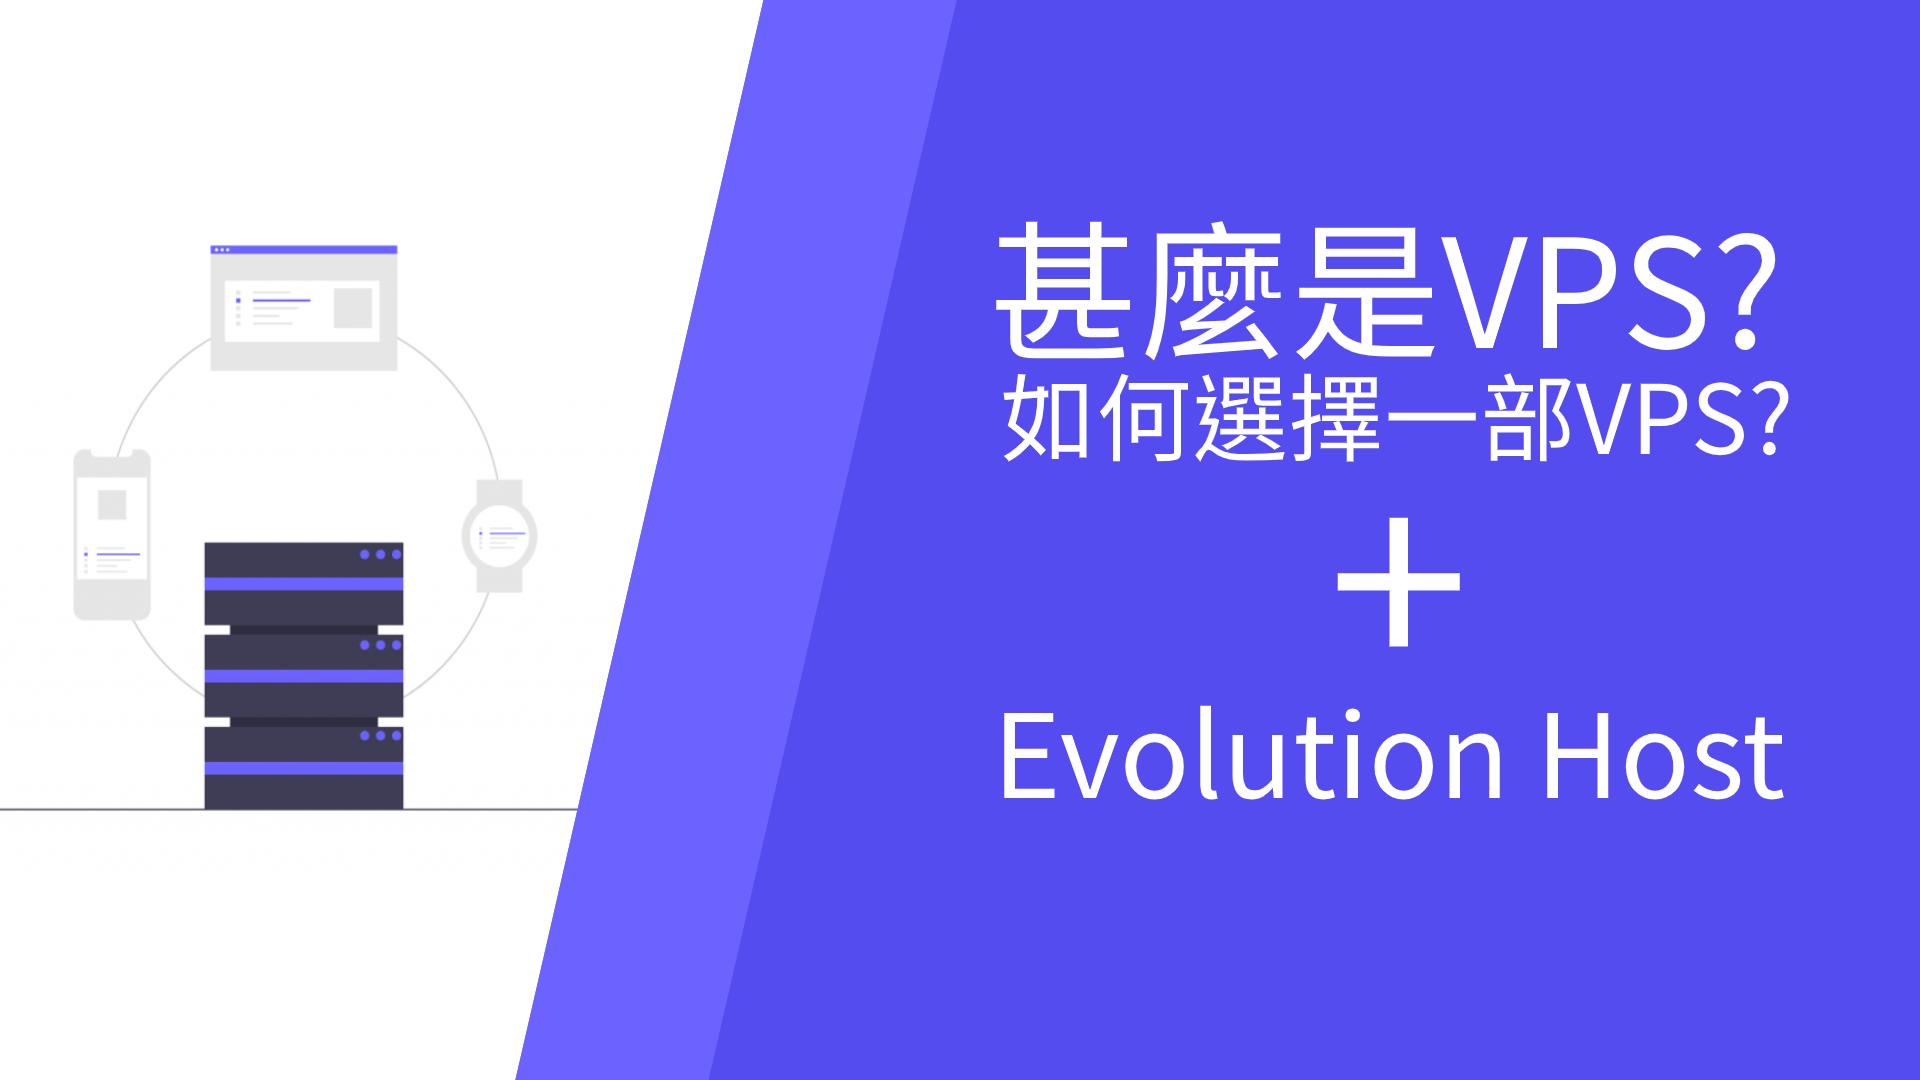 甚麼是VPS?如何選擇一部VPS?Evolution Host介紹